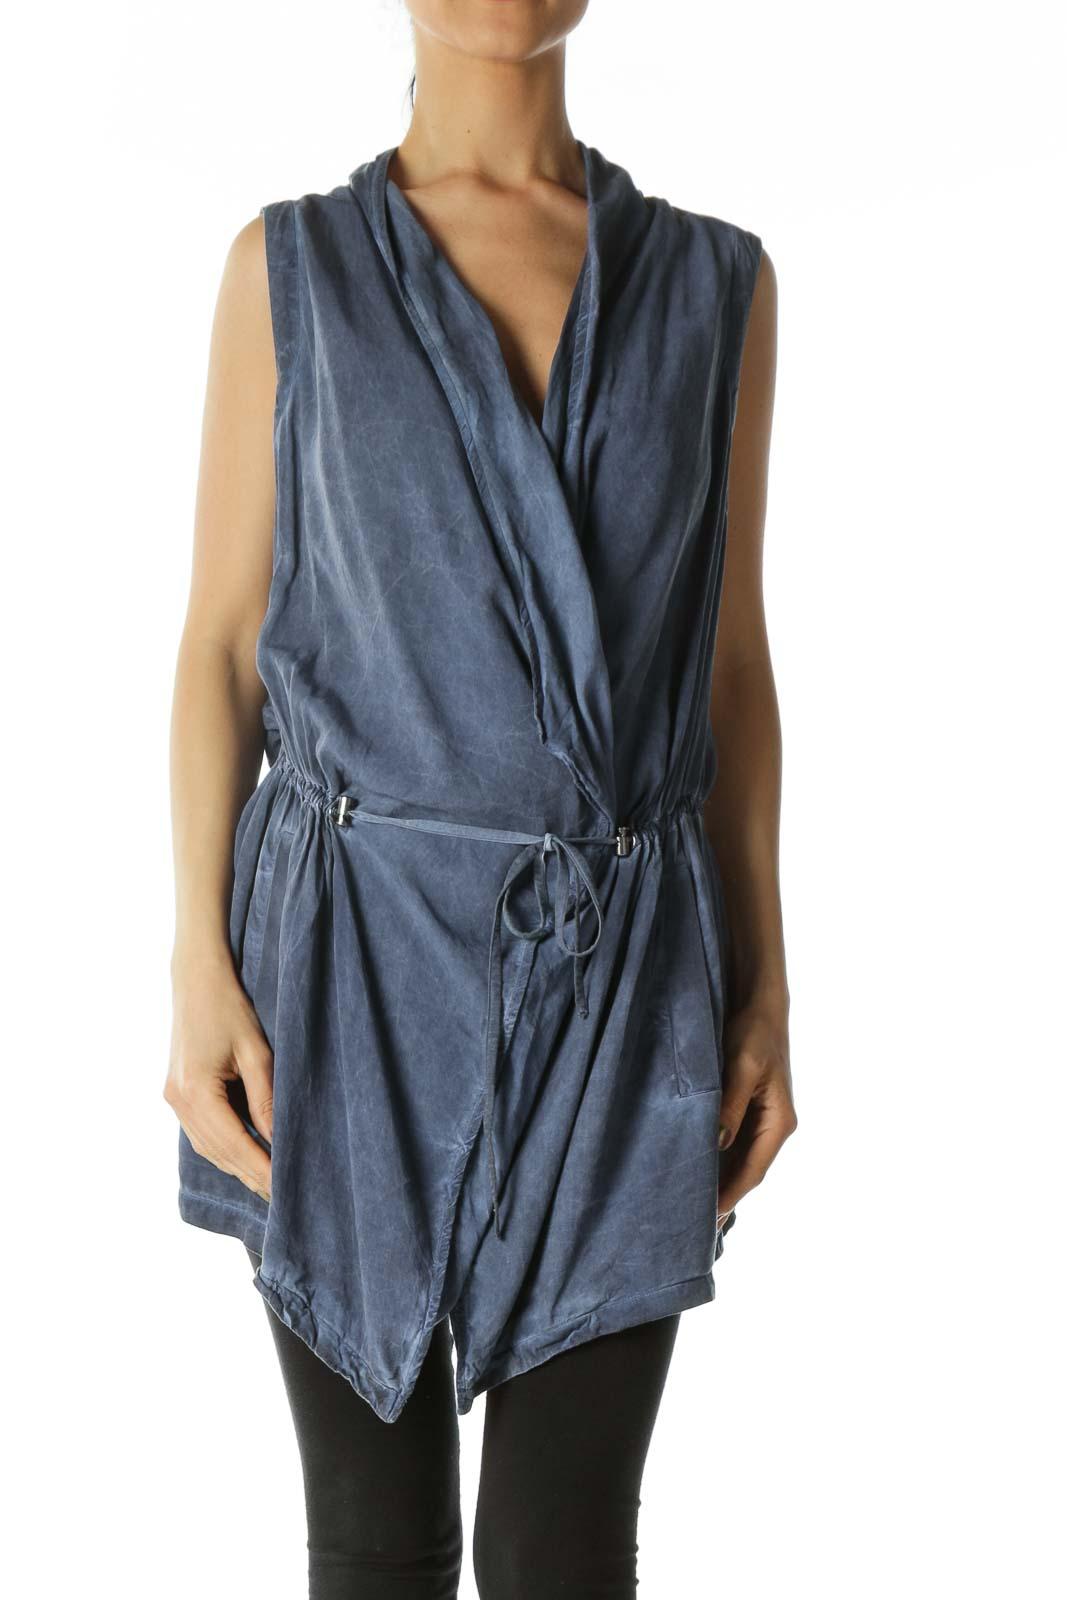 Denim Blue Waist Tie Vest Dress Front